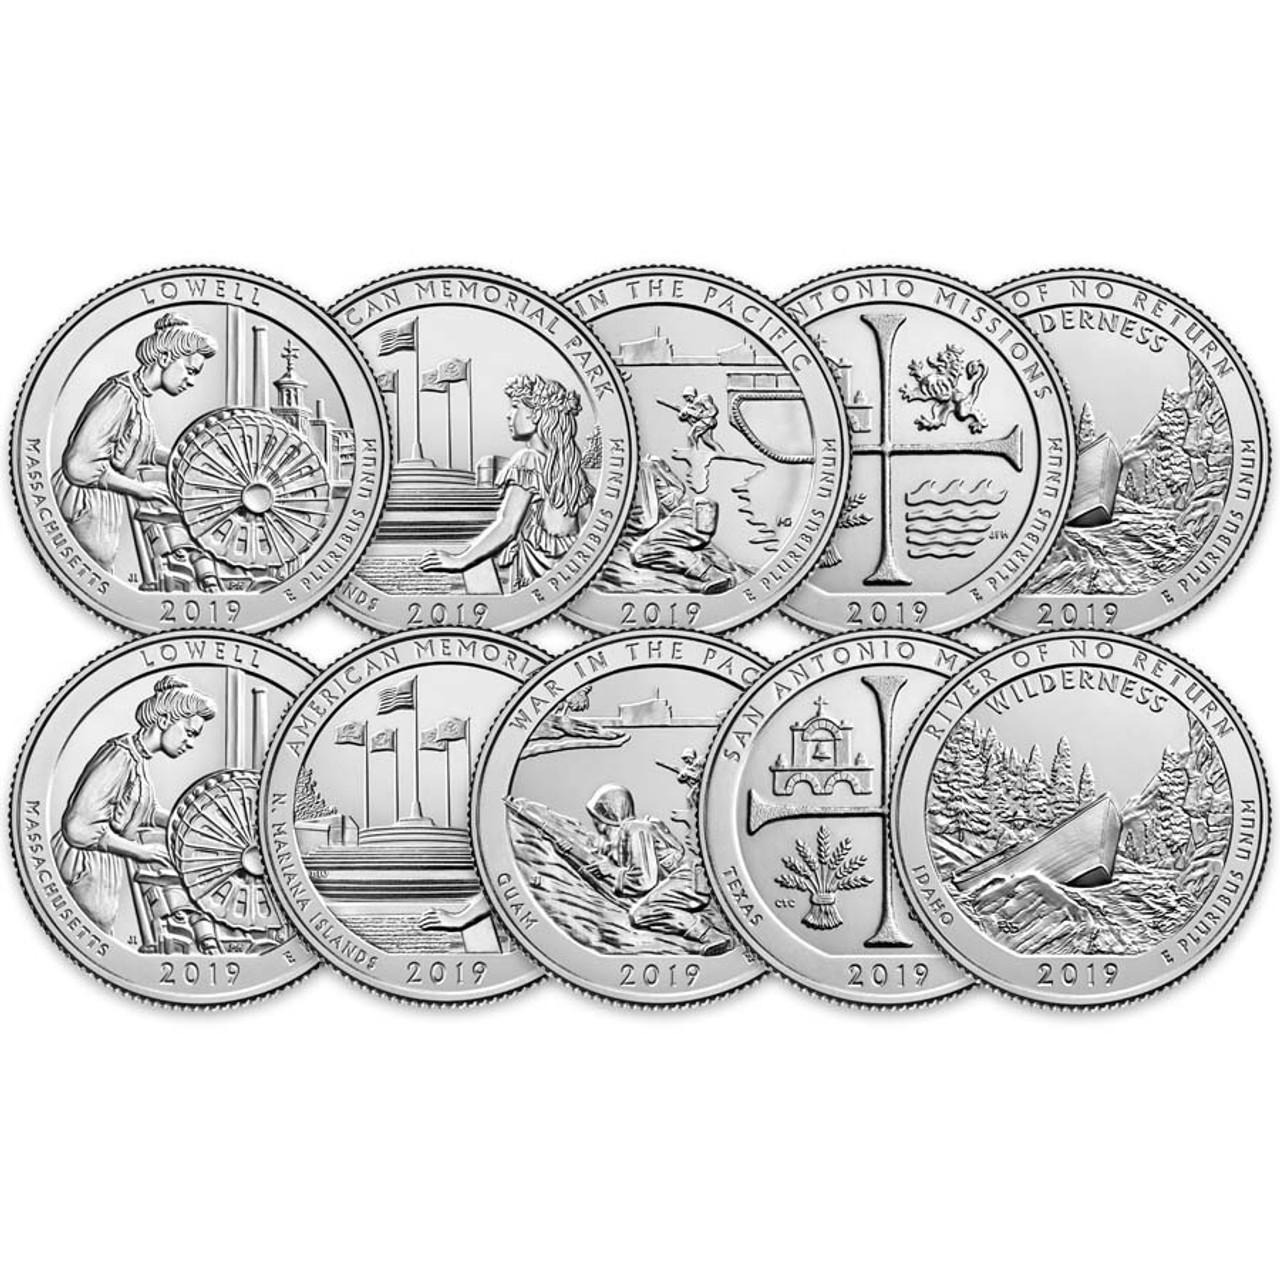 2019 P & D National Parks Quarter 10 Coin Set Brilliant Uncirculated Image 1